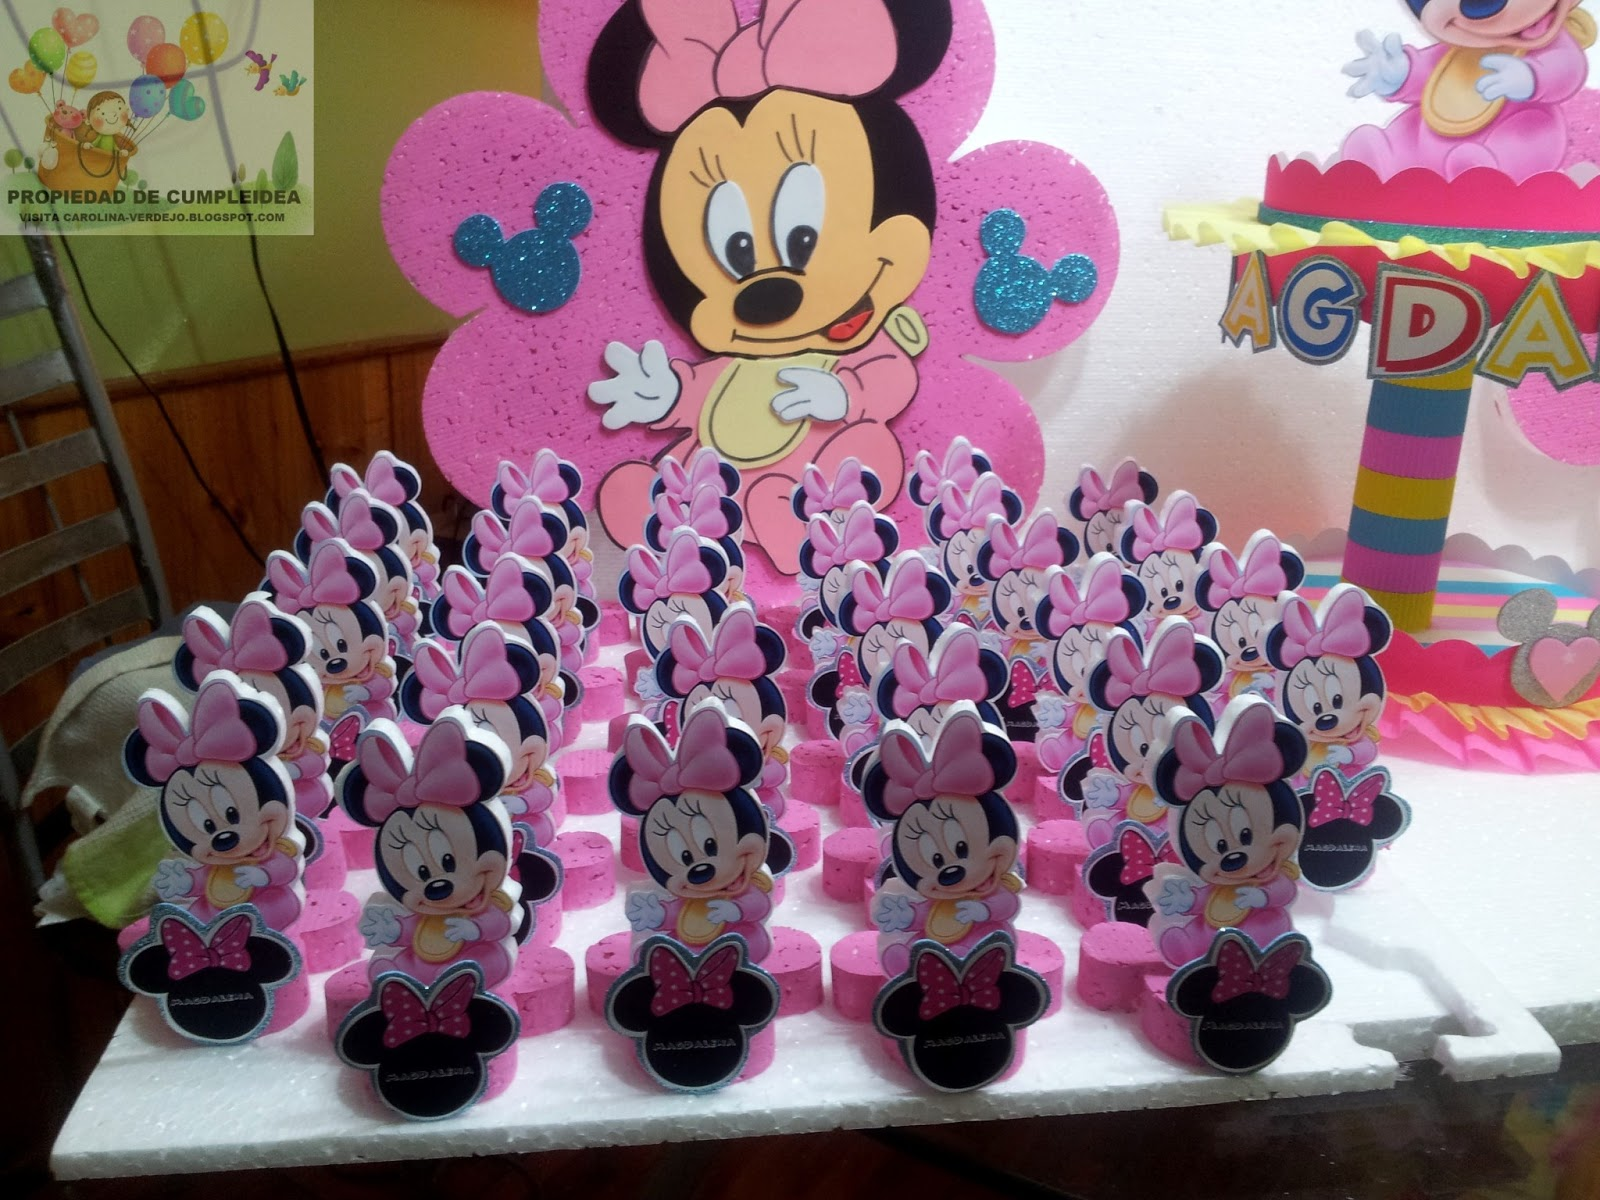 1600px for Decoracion minnie mouse